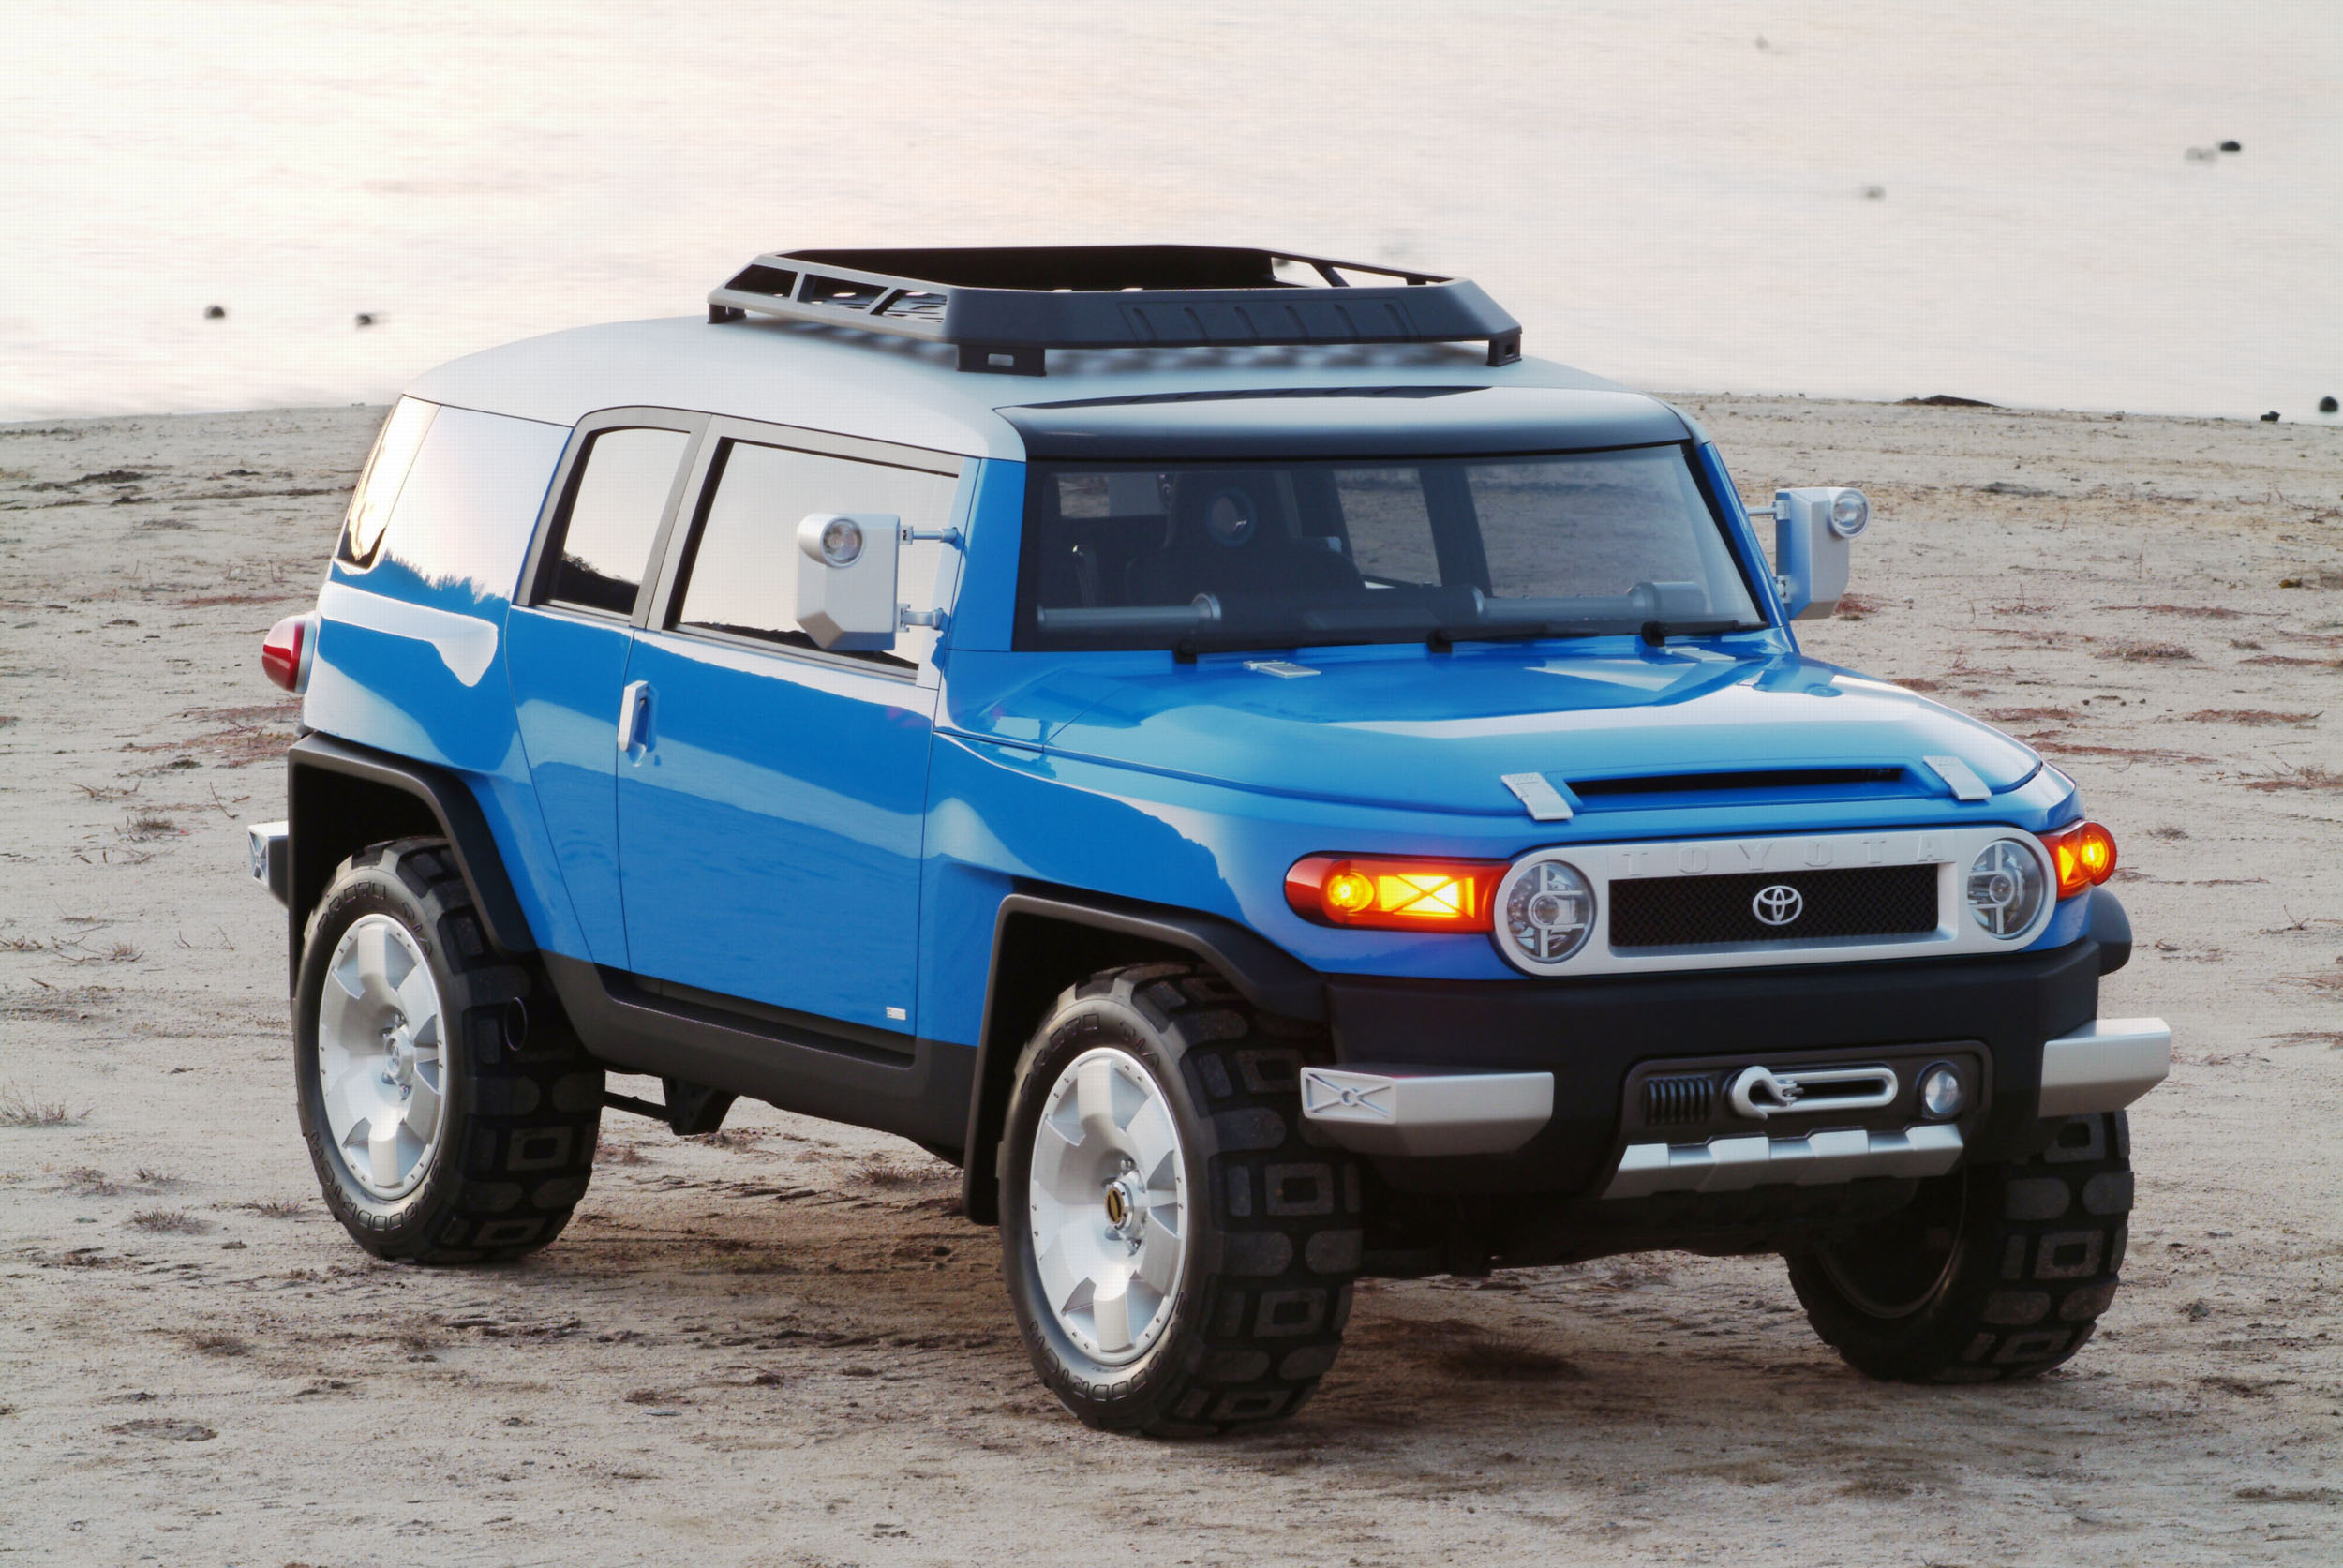 2003 FJ Cruiser Concept